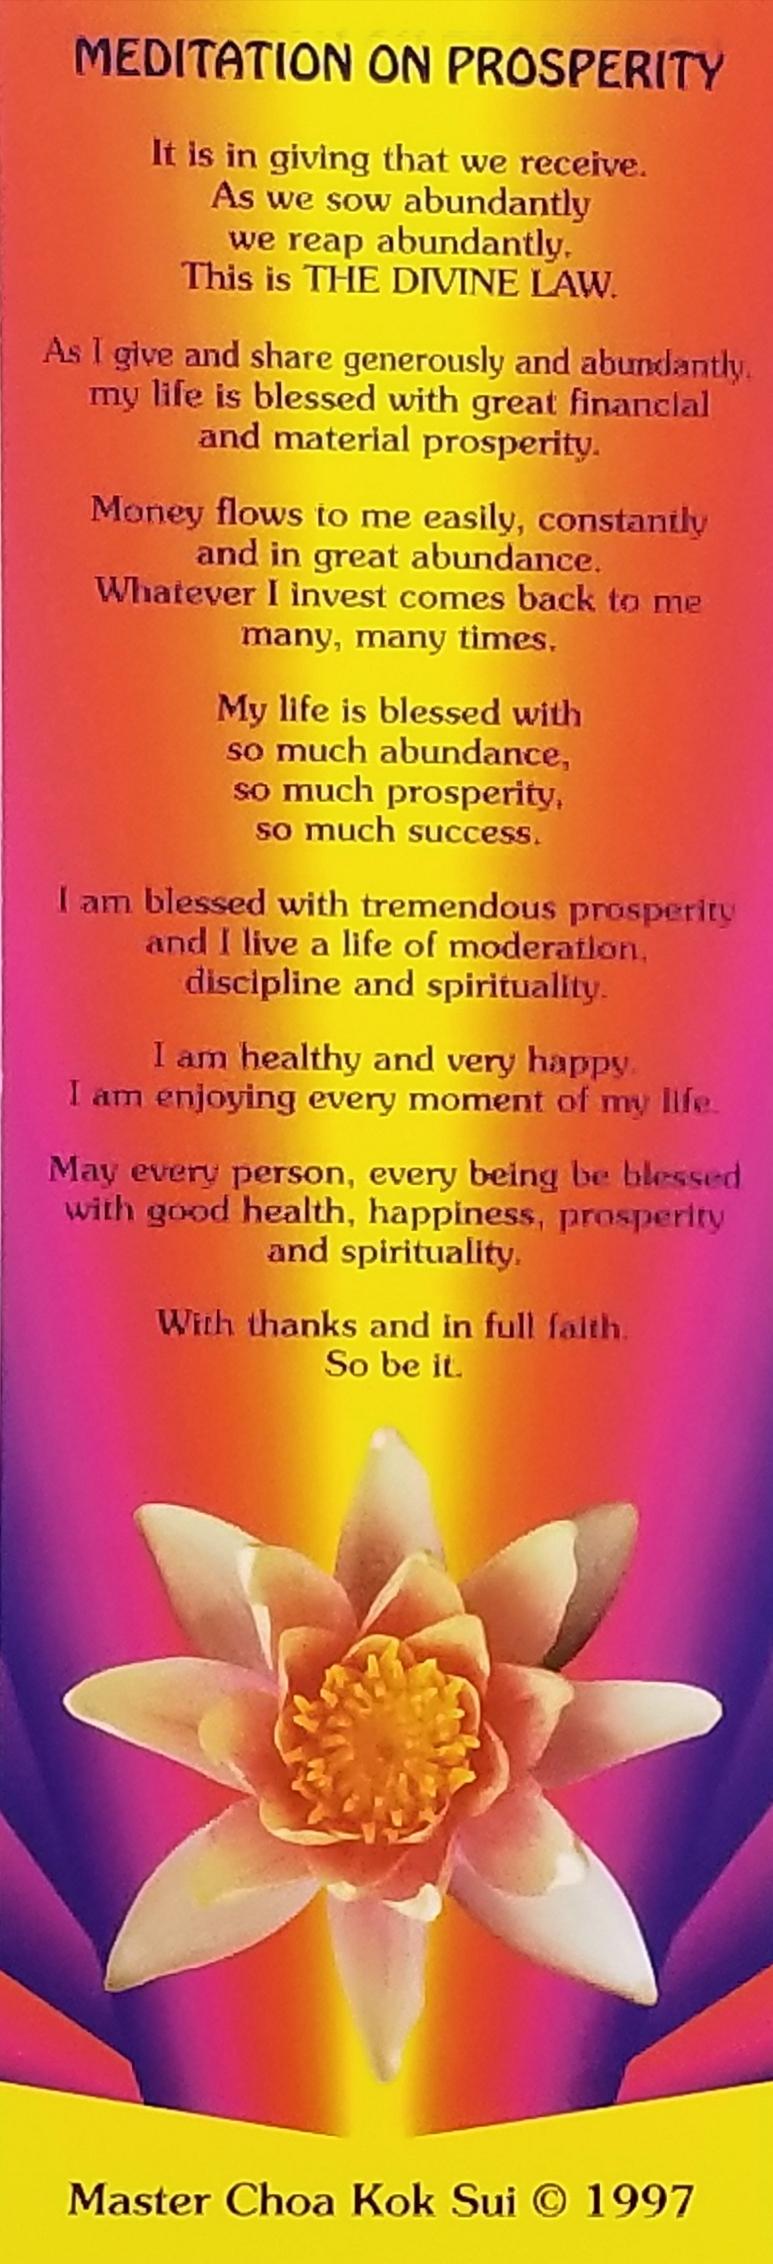 Meditation on Prosperity bookmark